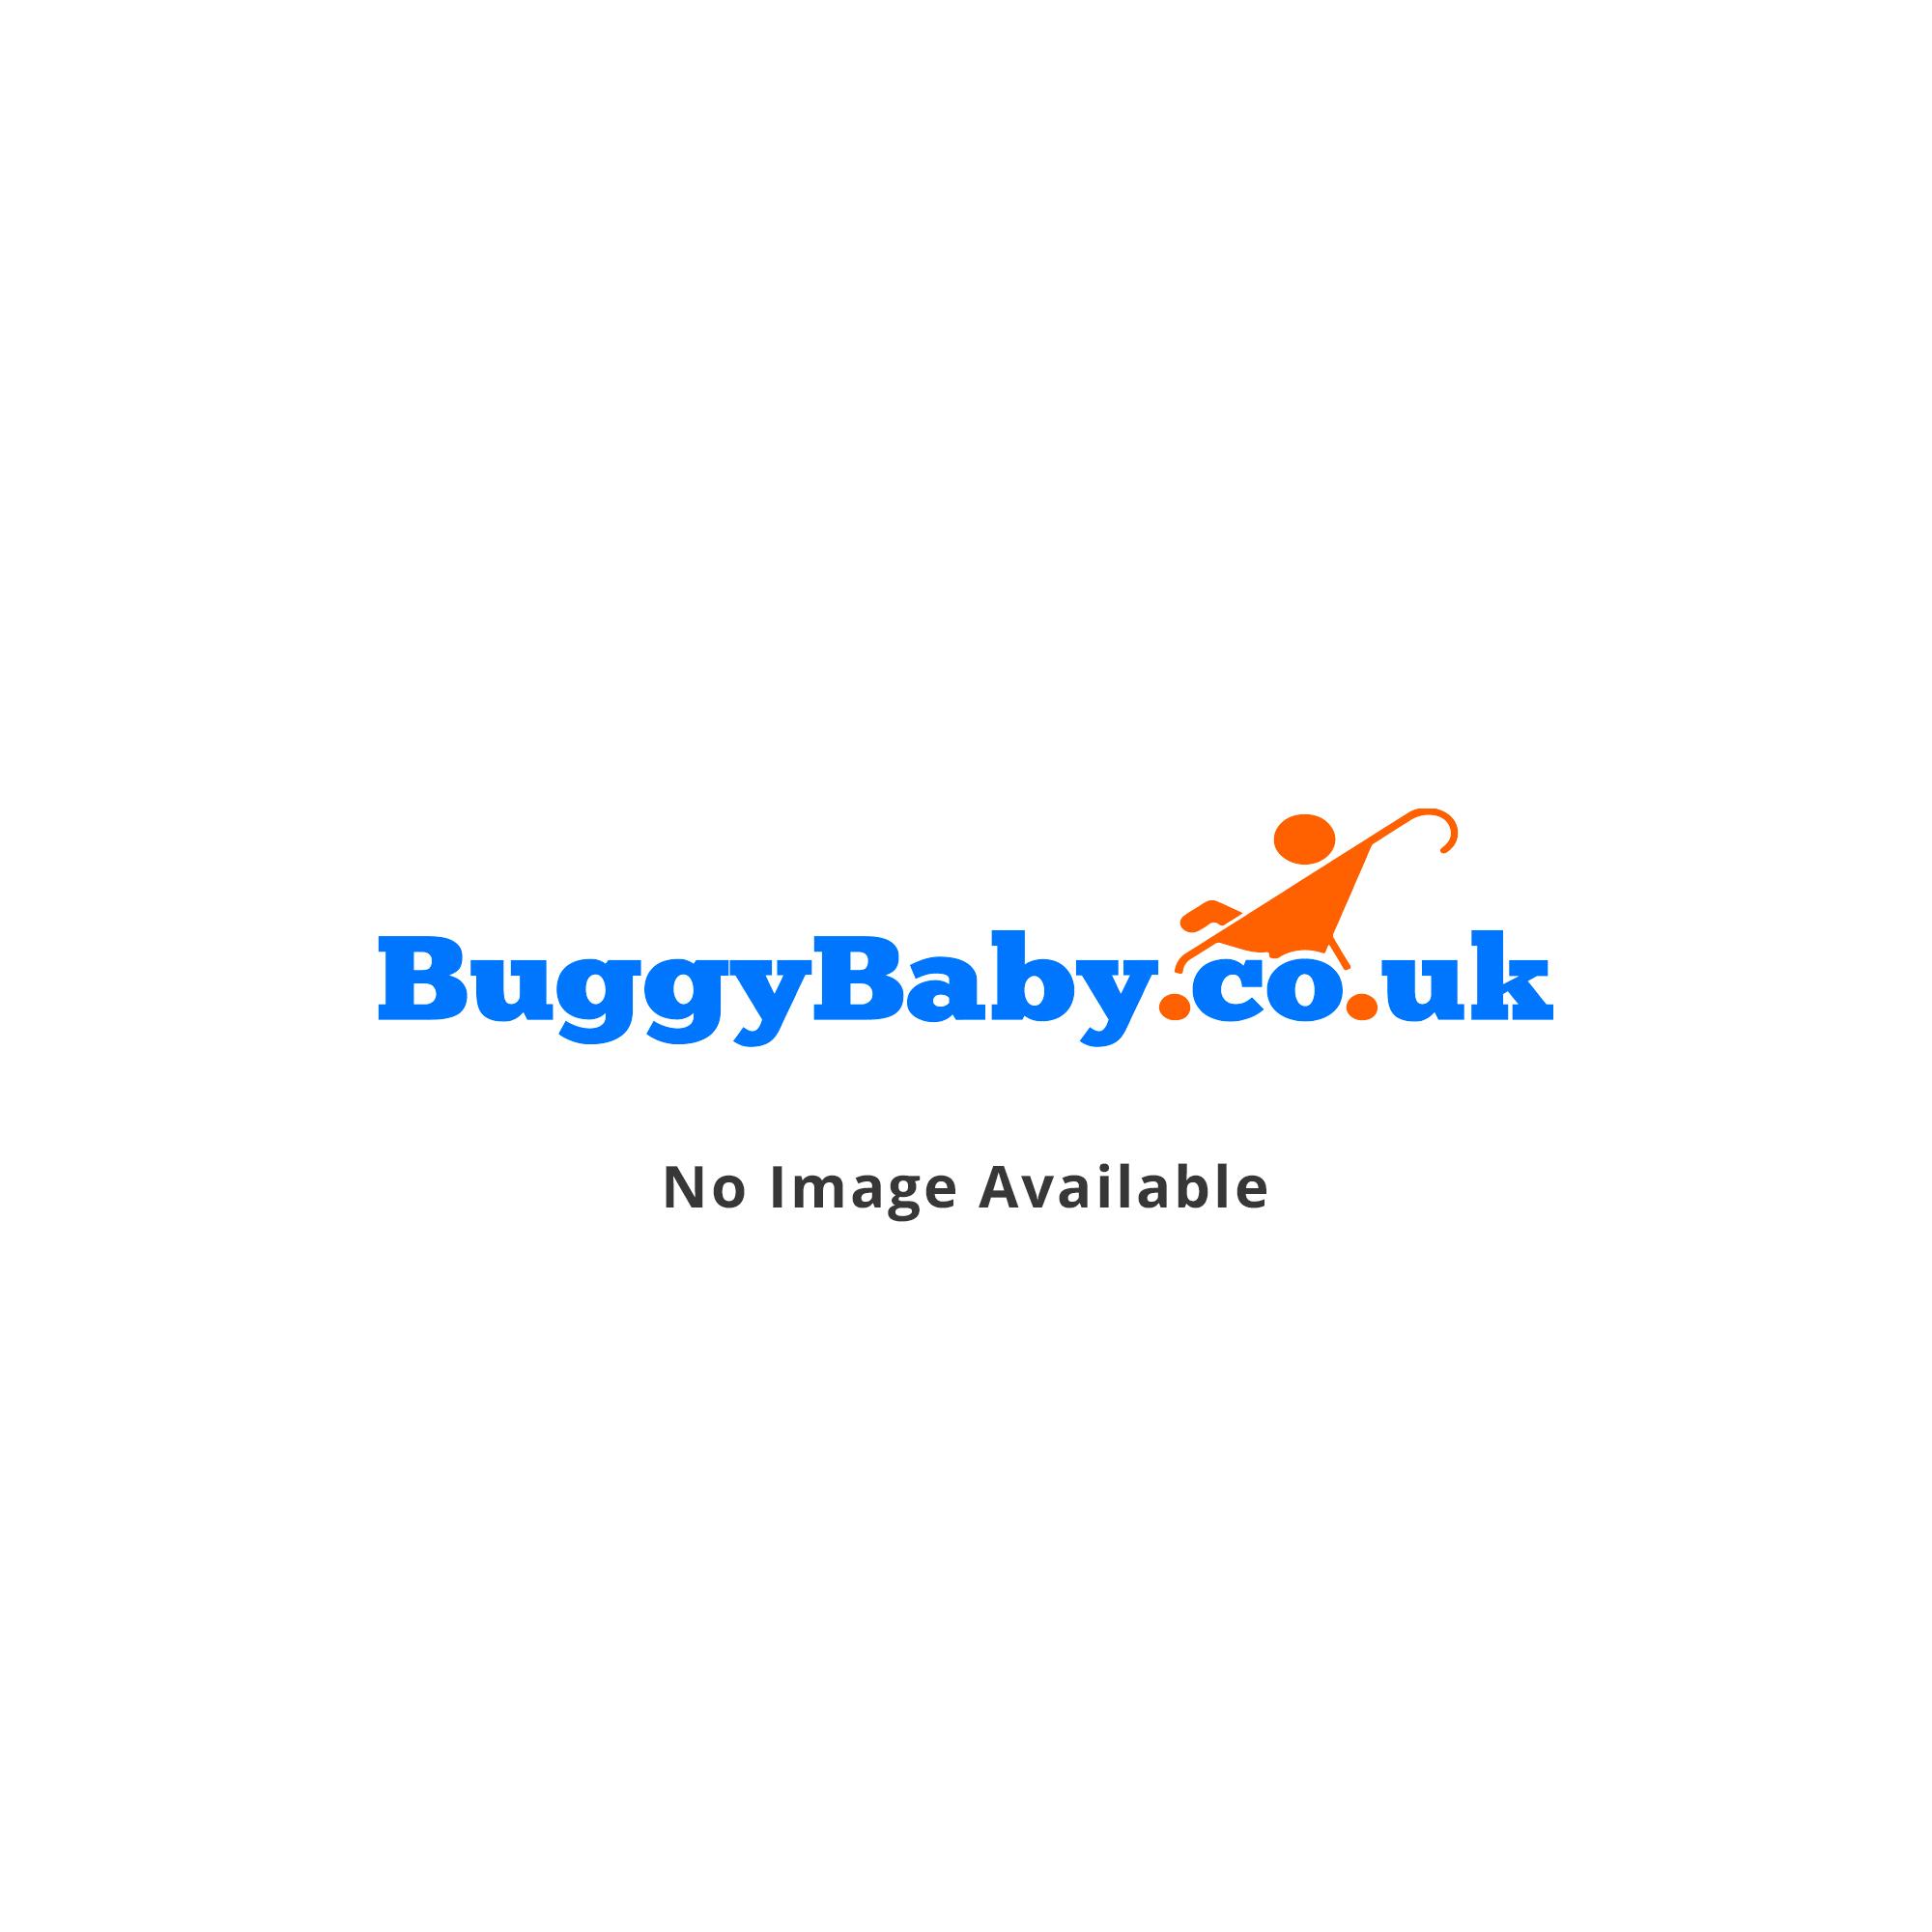 Mako Elite 2 Group 2 3 Car Seat - Prime Silent Grey